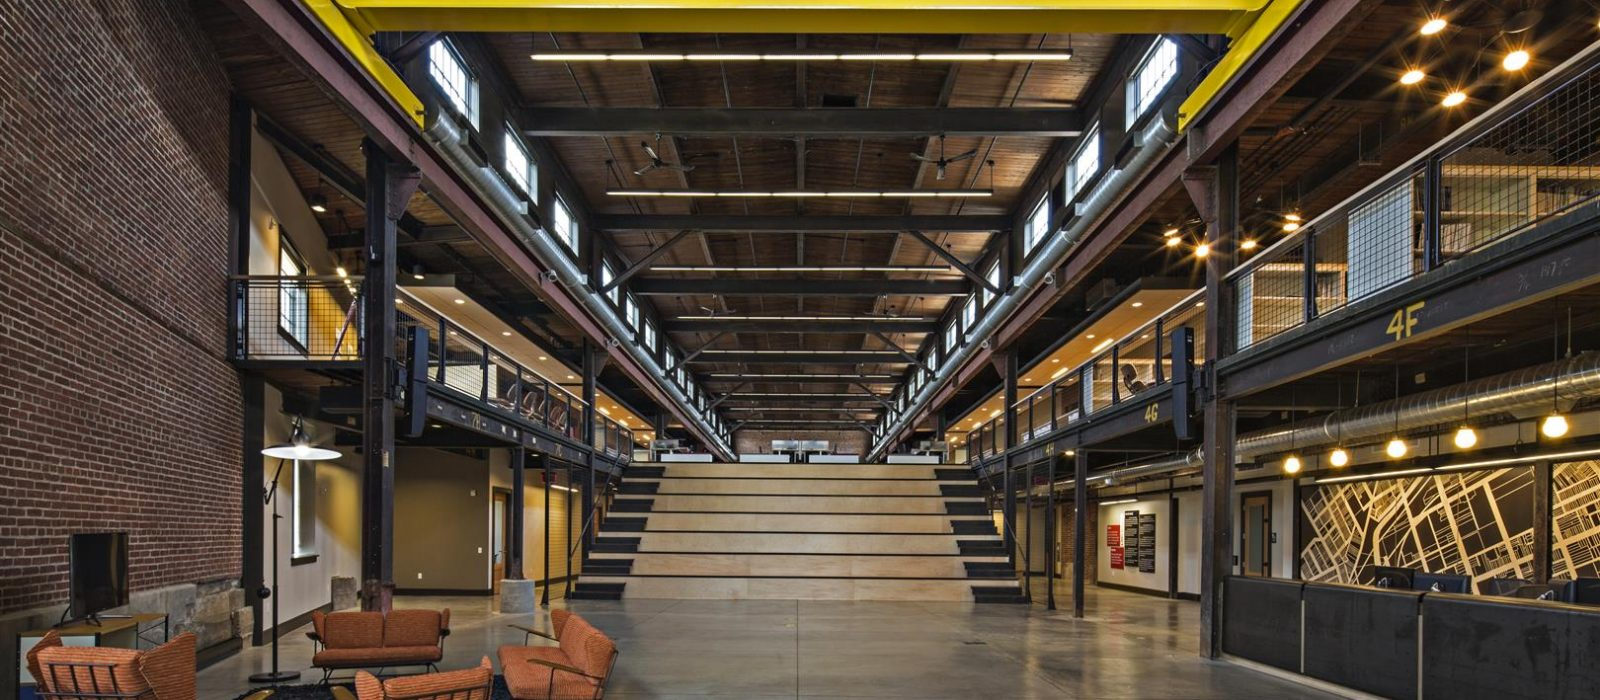 Warehaus Office Renovations - Kinsley Construction